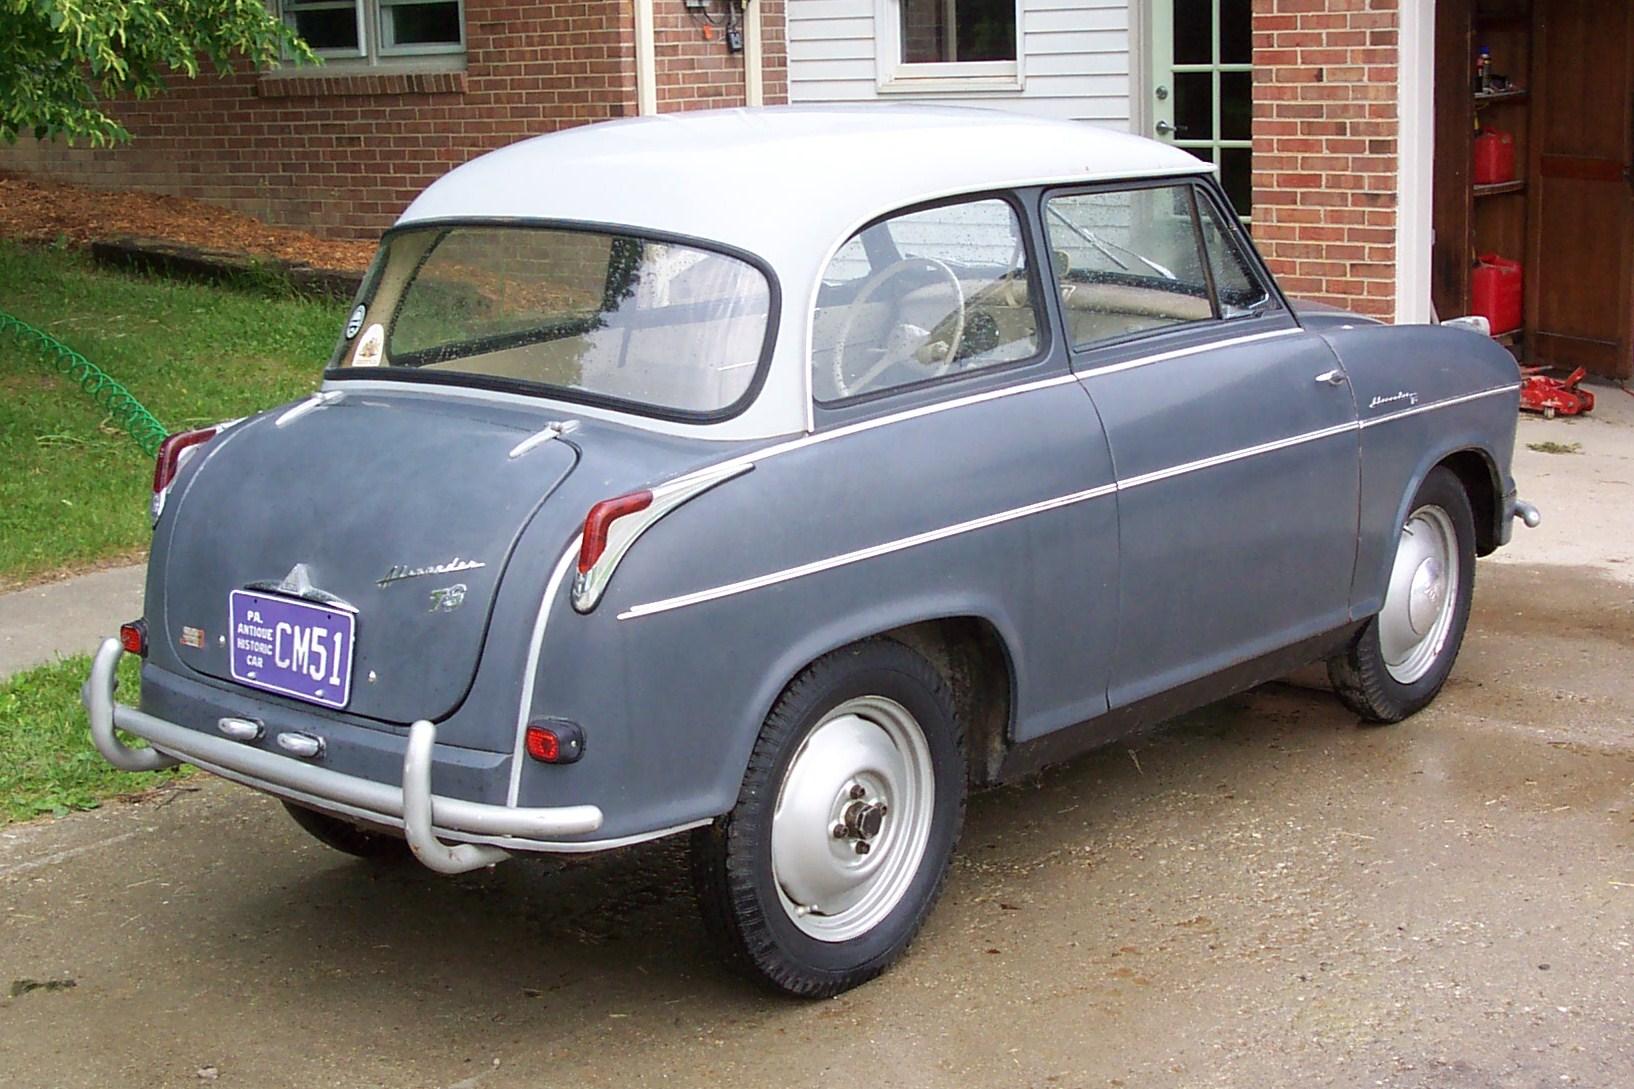 lloyd alexander ts 1959 borgward car lcar cars classic old pictures. Black Bedroom Furniture Sets. Home Design Ideas